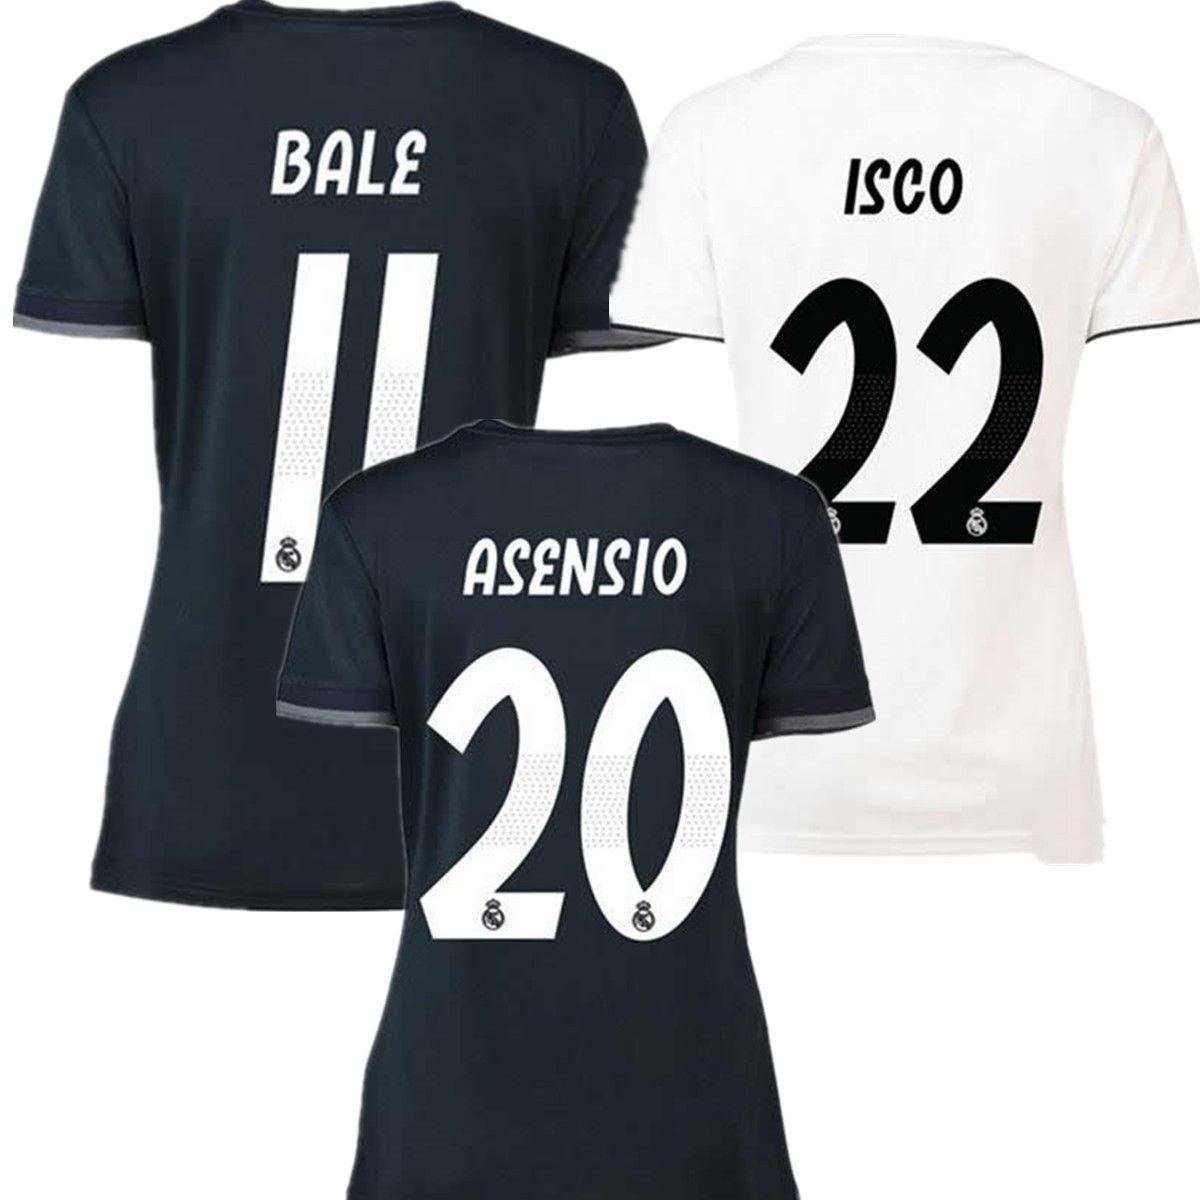 18 19 Mujeres Camiseta De Fútbol Real Madrid Camiseta De Fútbol RONALDO  BALE RAMOS KROOS BENZEMA LUCAS Camiseta 2018 2019 Modric Madrid Niña  Maillot Por ... 02bf14108afd0